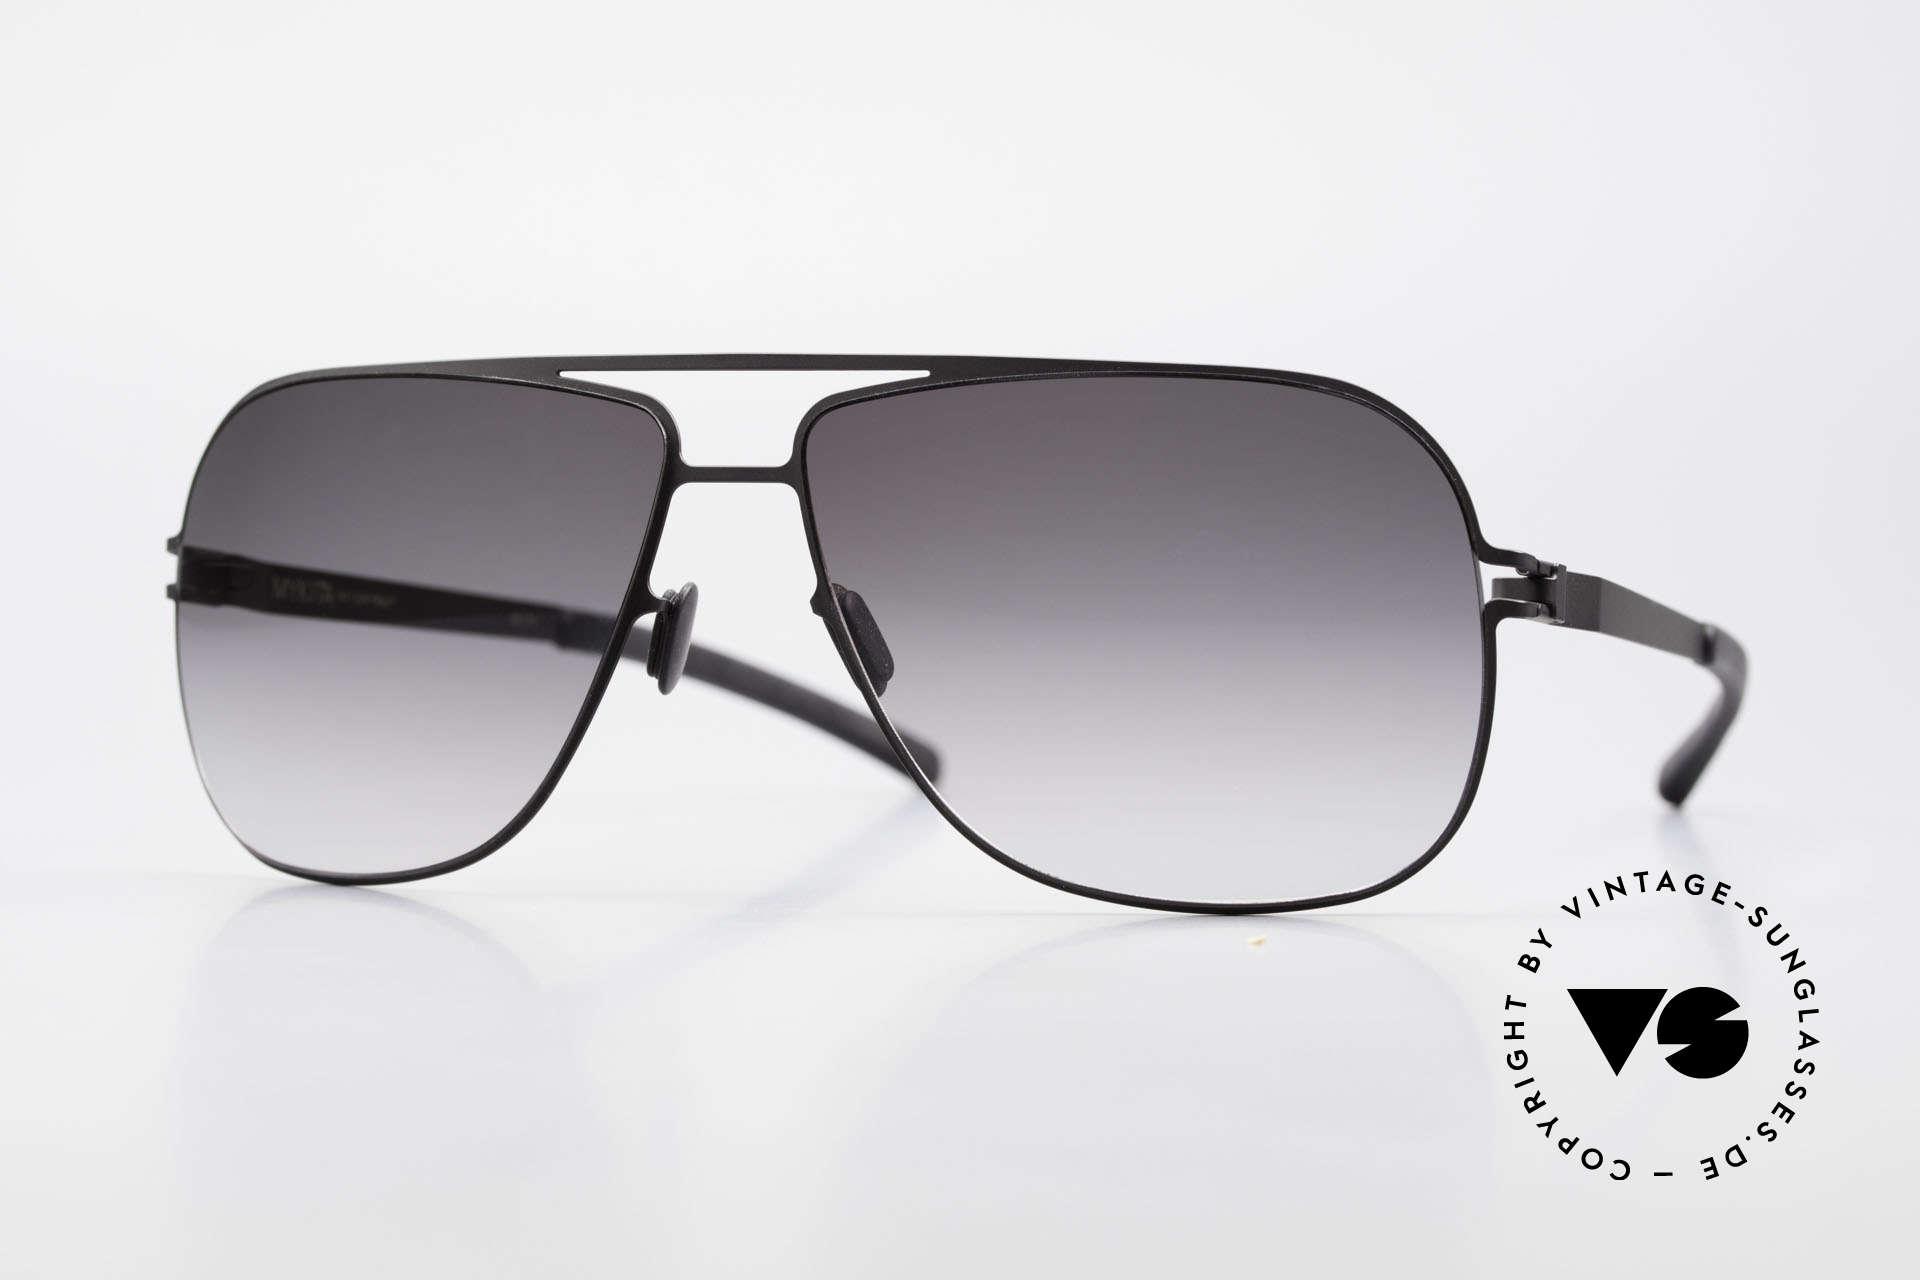 Mykita Rolf Brad Pitt Mykita Sunglasses, VINTAGE Angelina Jolie Mykita sunglasses from 2011, Made for Men and Women